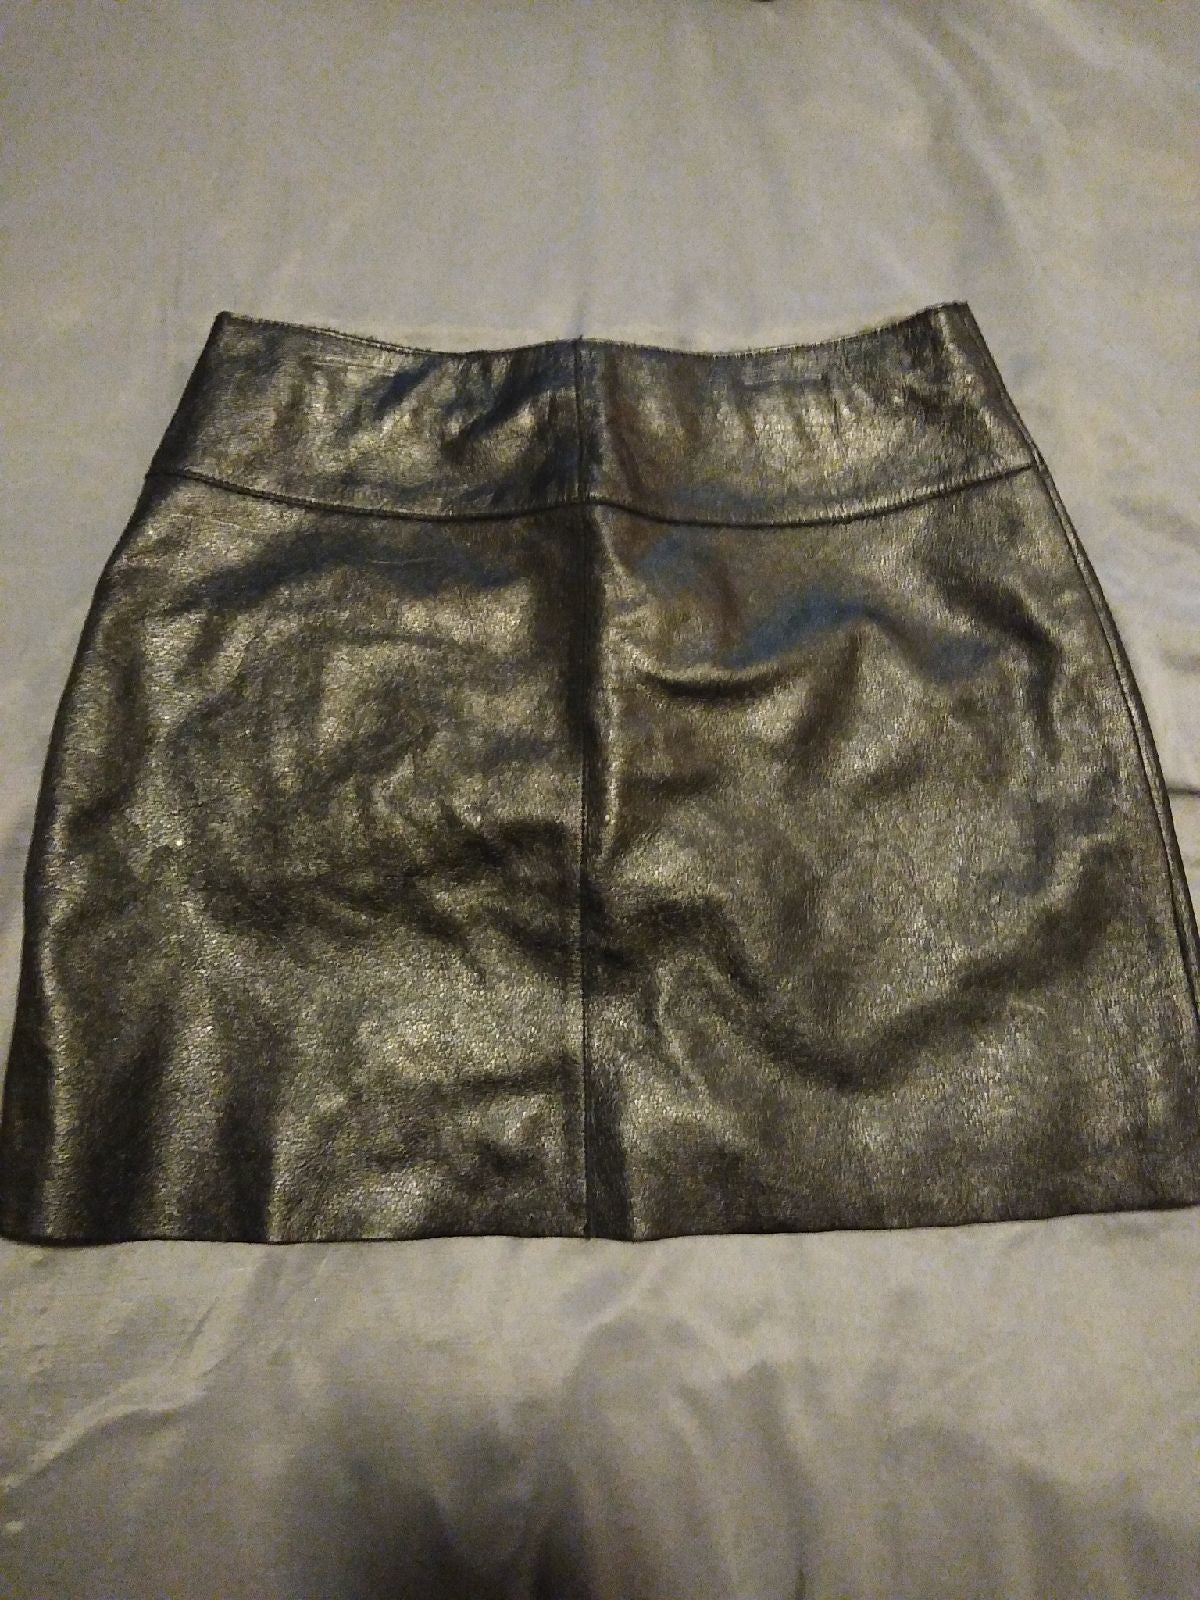 Wilson's Leather skirt